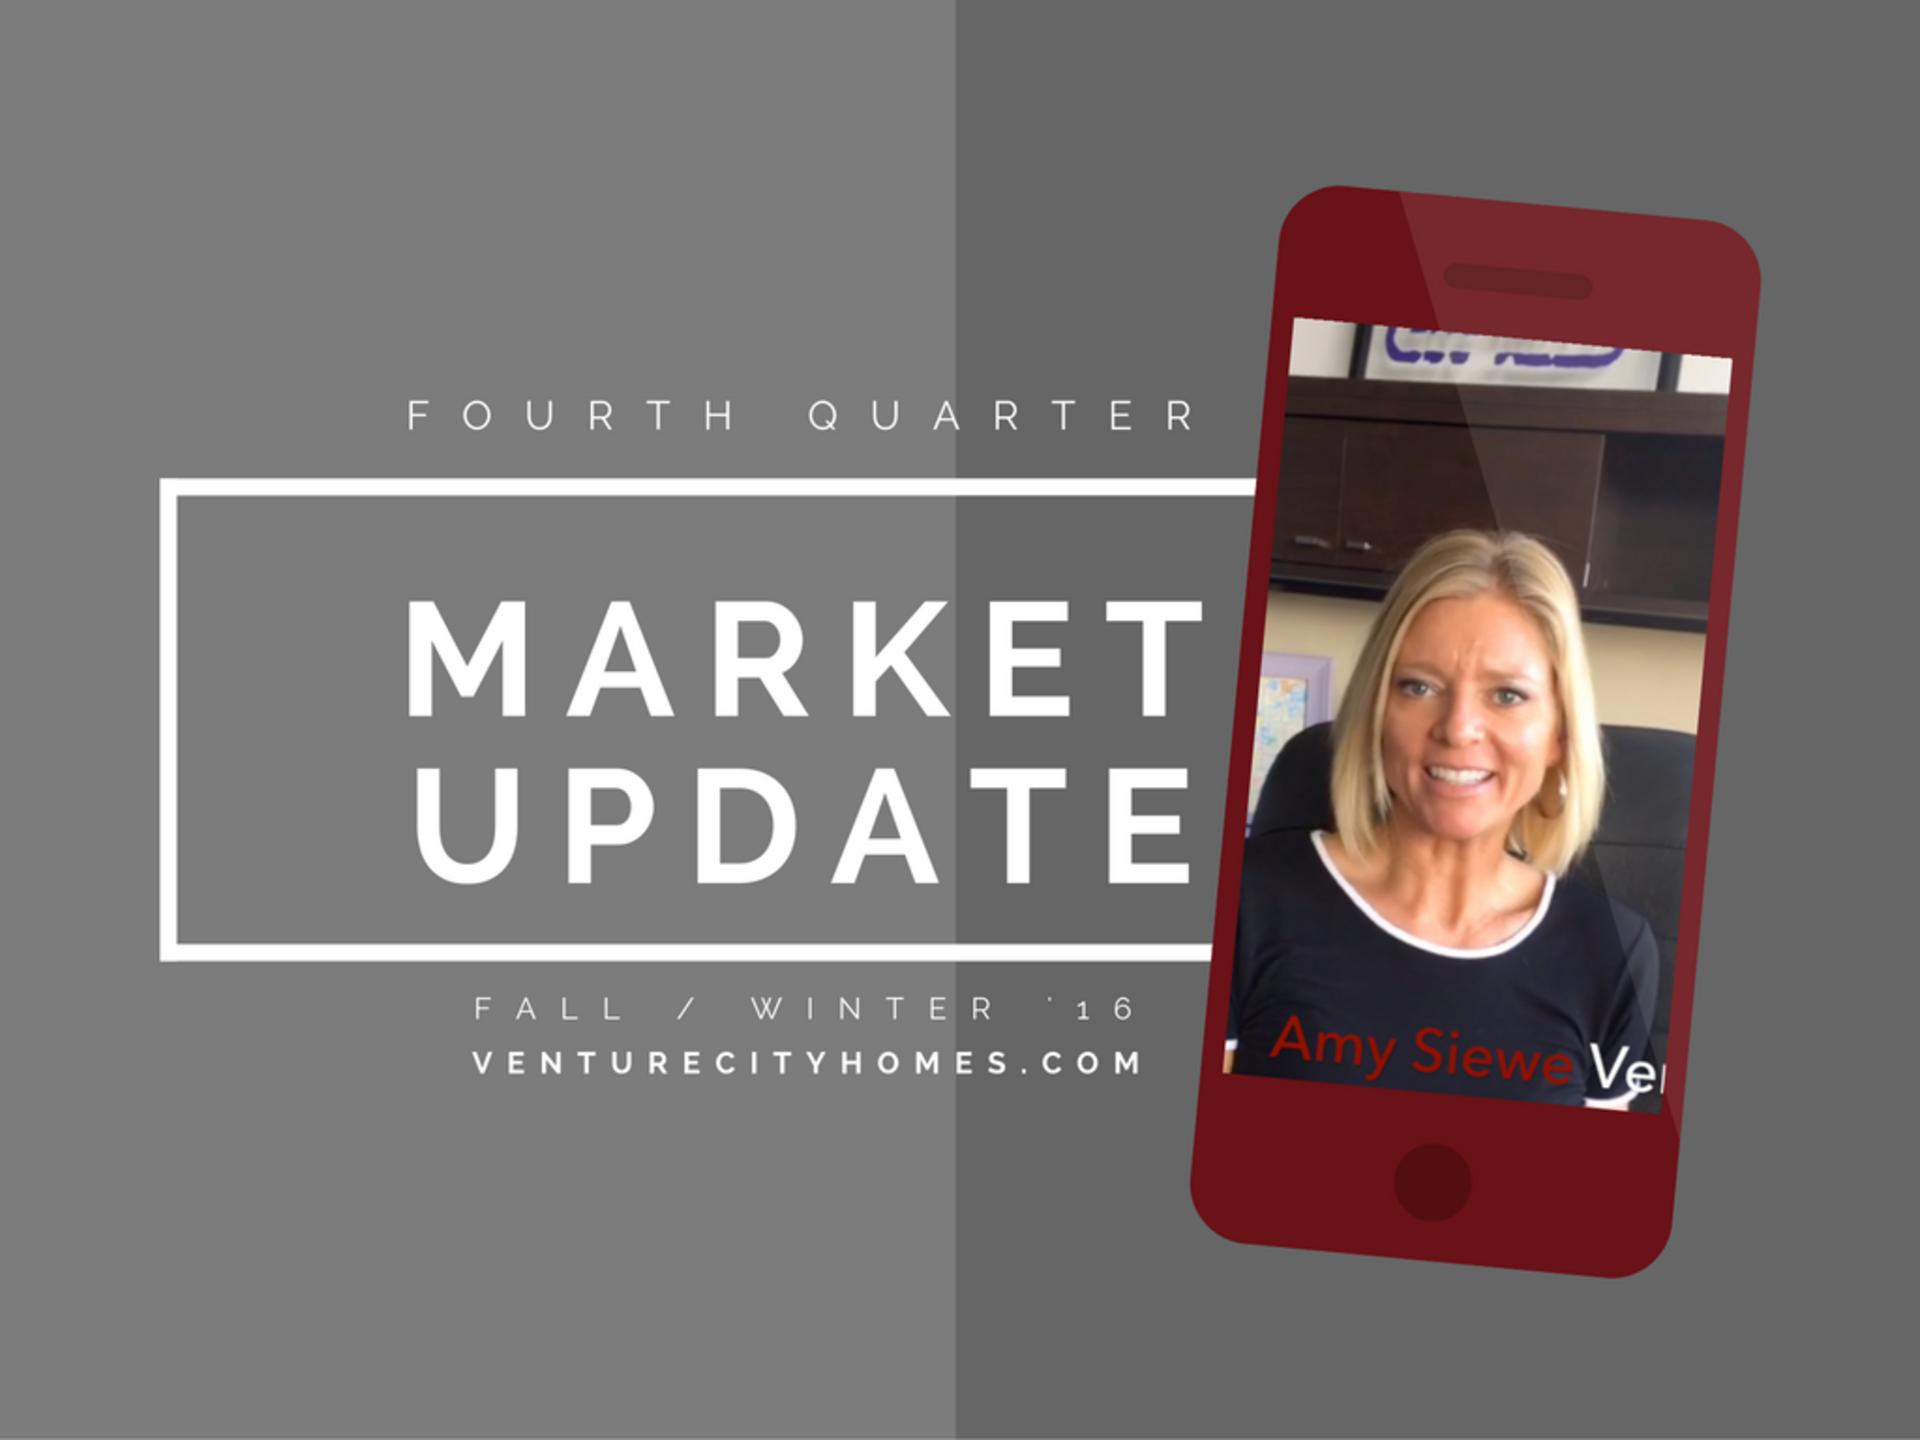 Fourth Quarter Market Update, November 2016